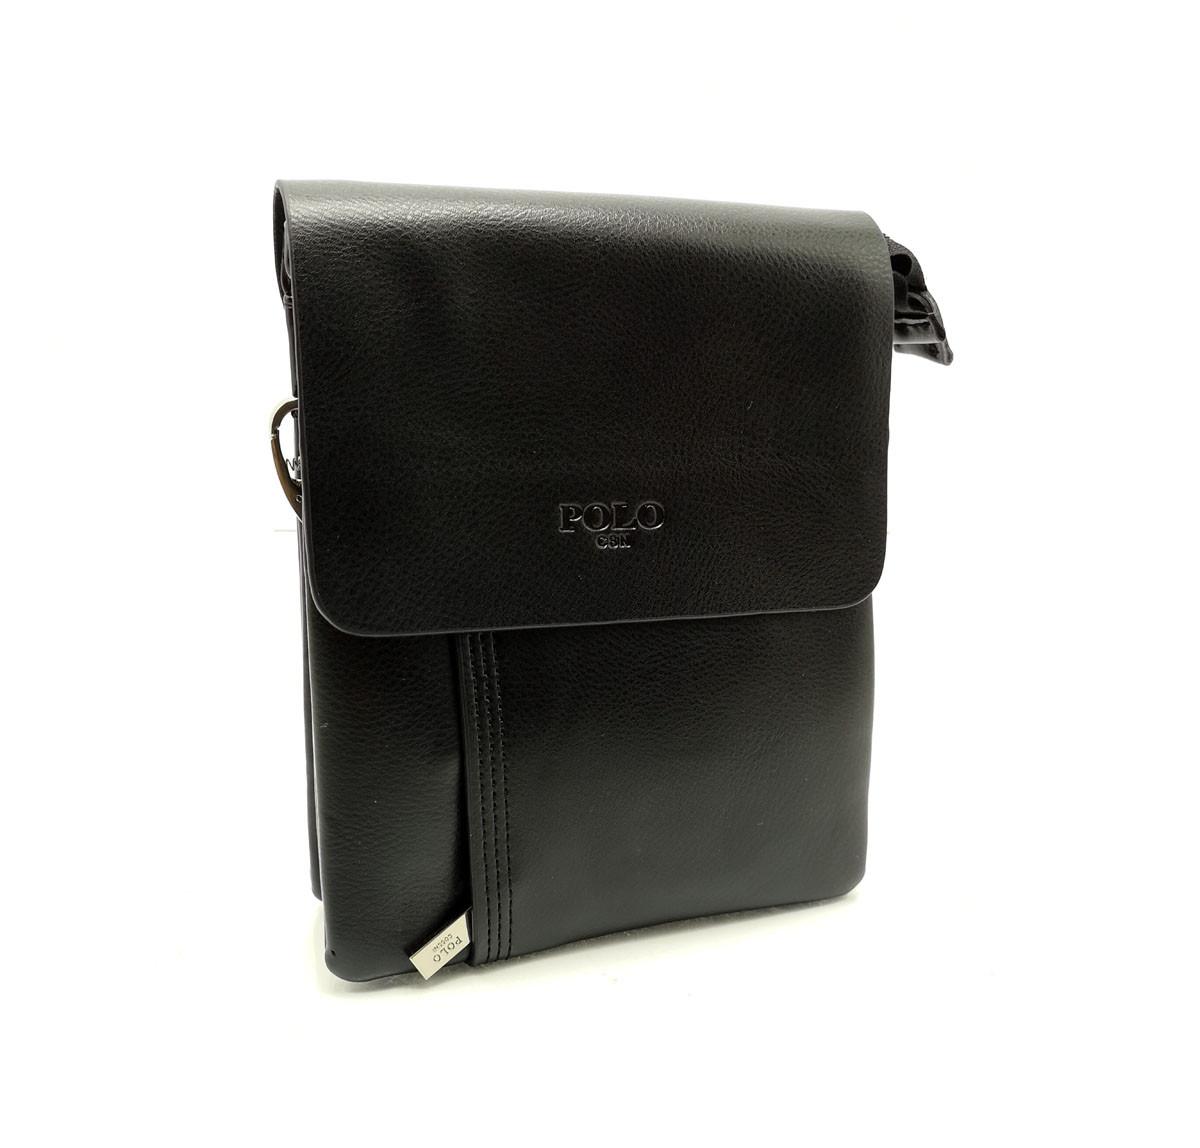 Мужская сумка Polo клапан кожа (b372-1)